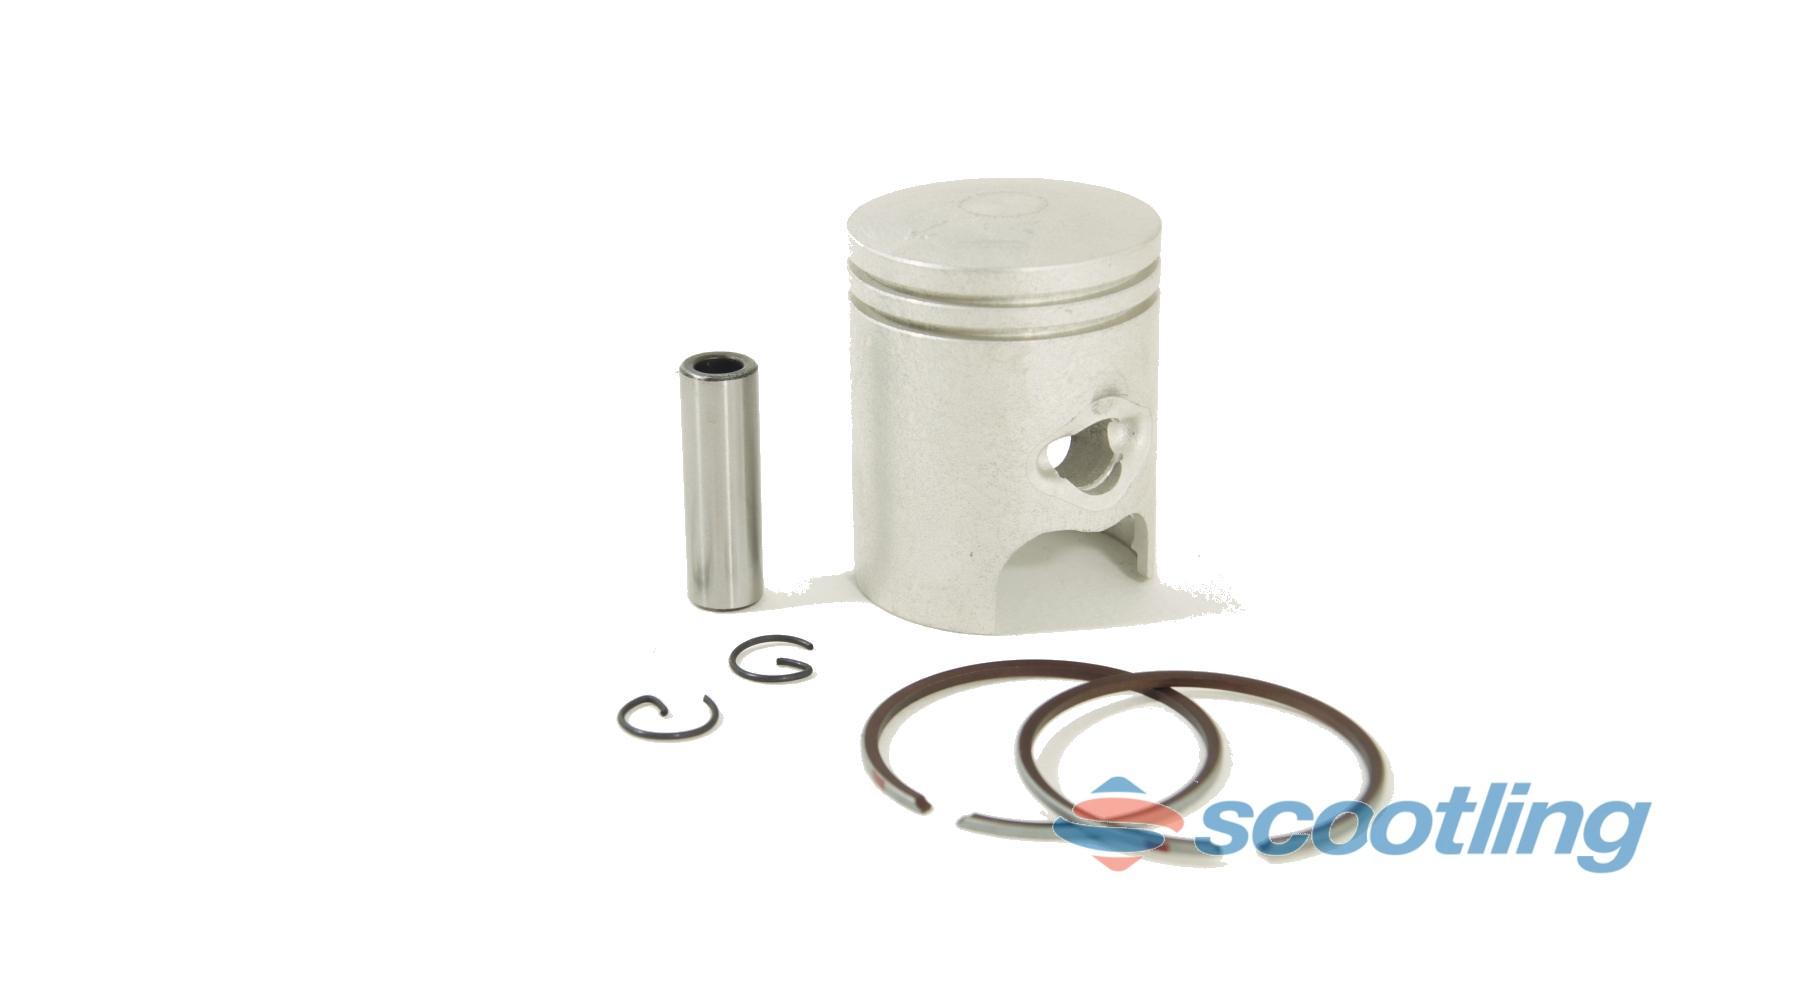 Honda piston kit for 50cc 2T (horizontal motor) standard